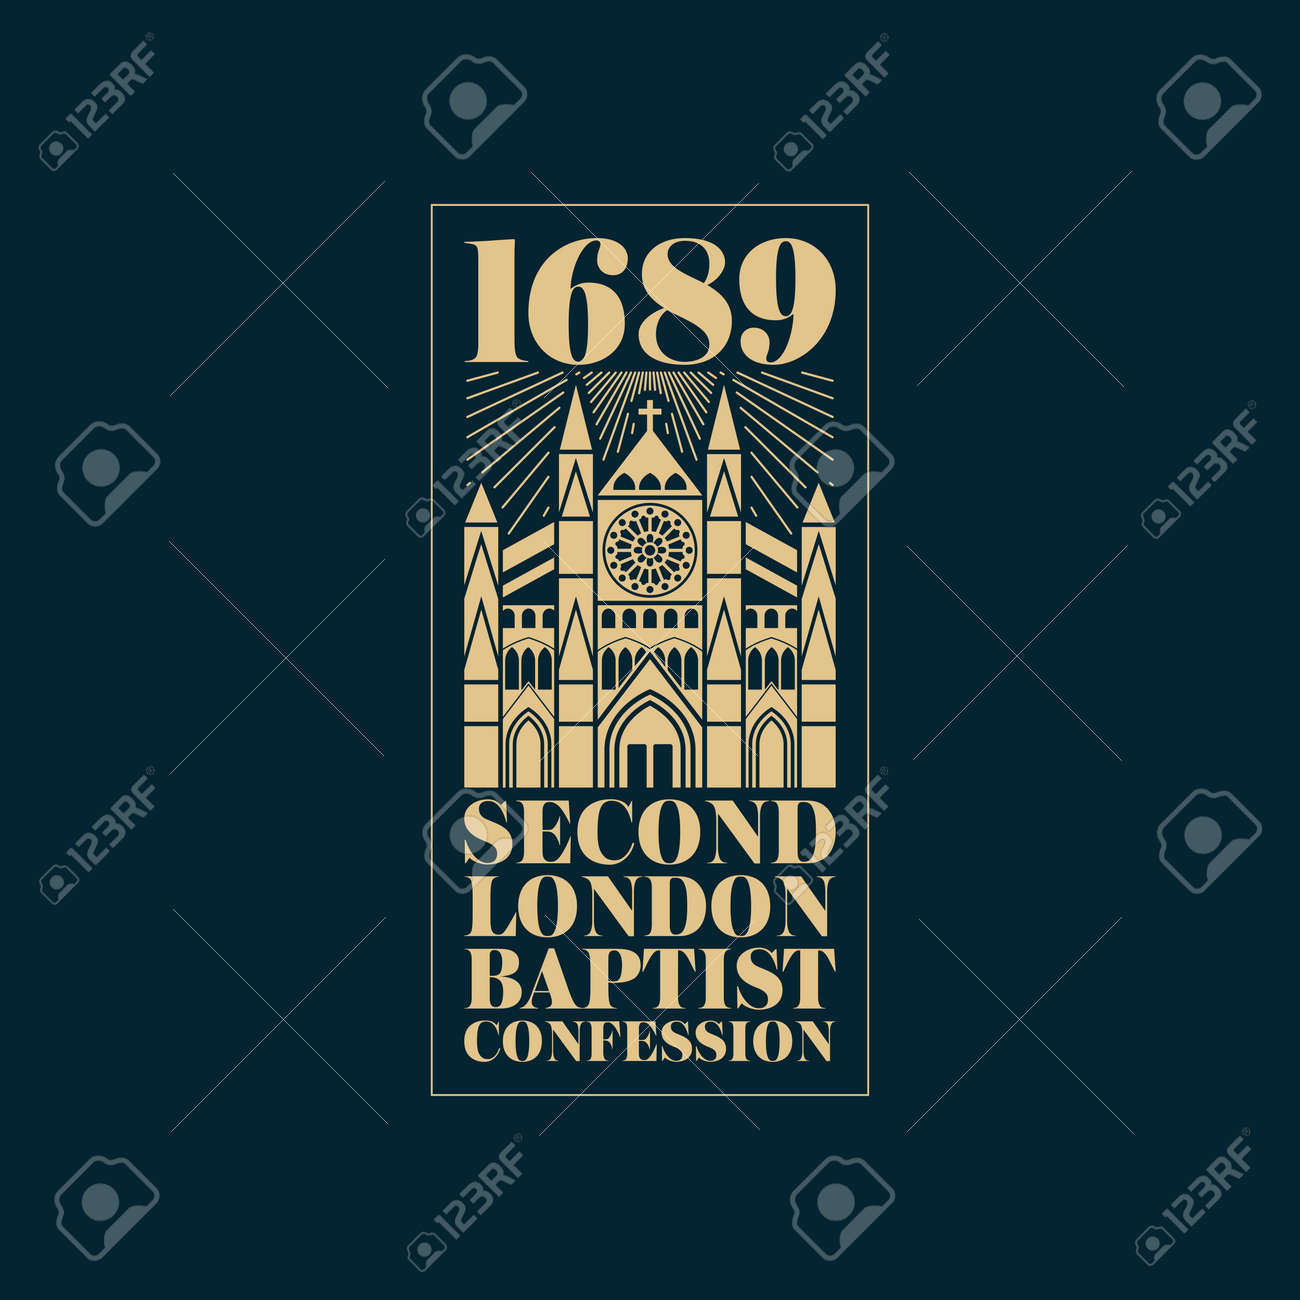 Reformed christian art. The 1689 Baptist Confession of Faith. - 166913166